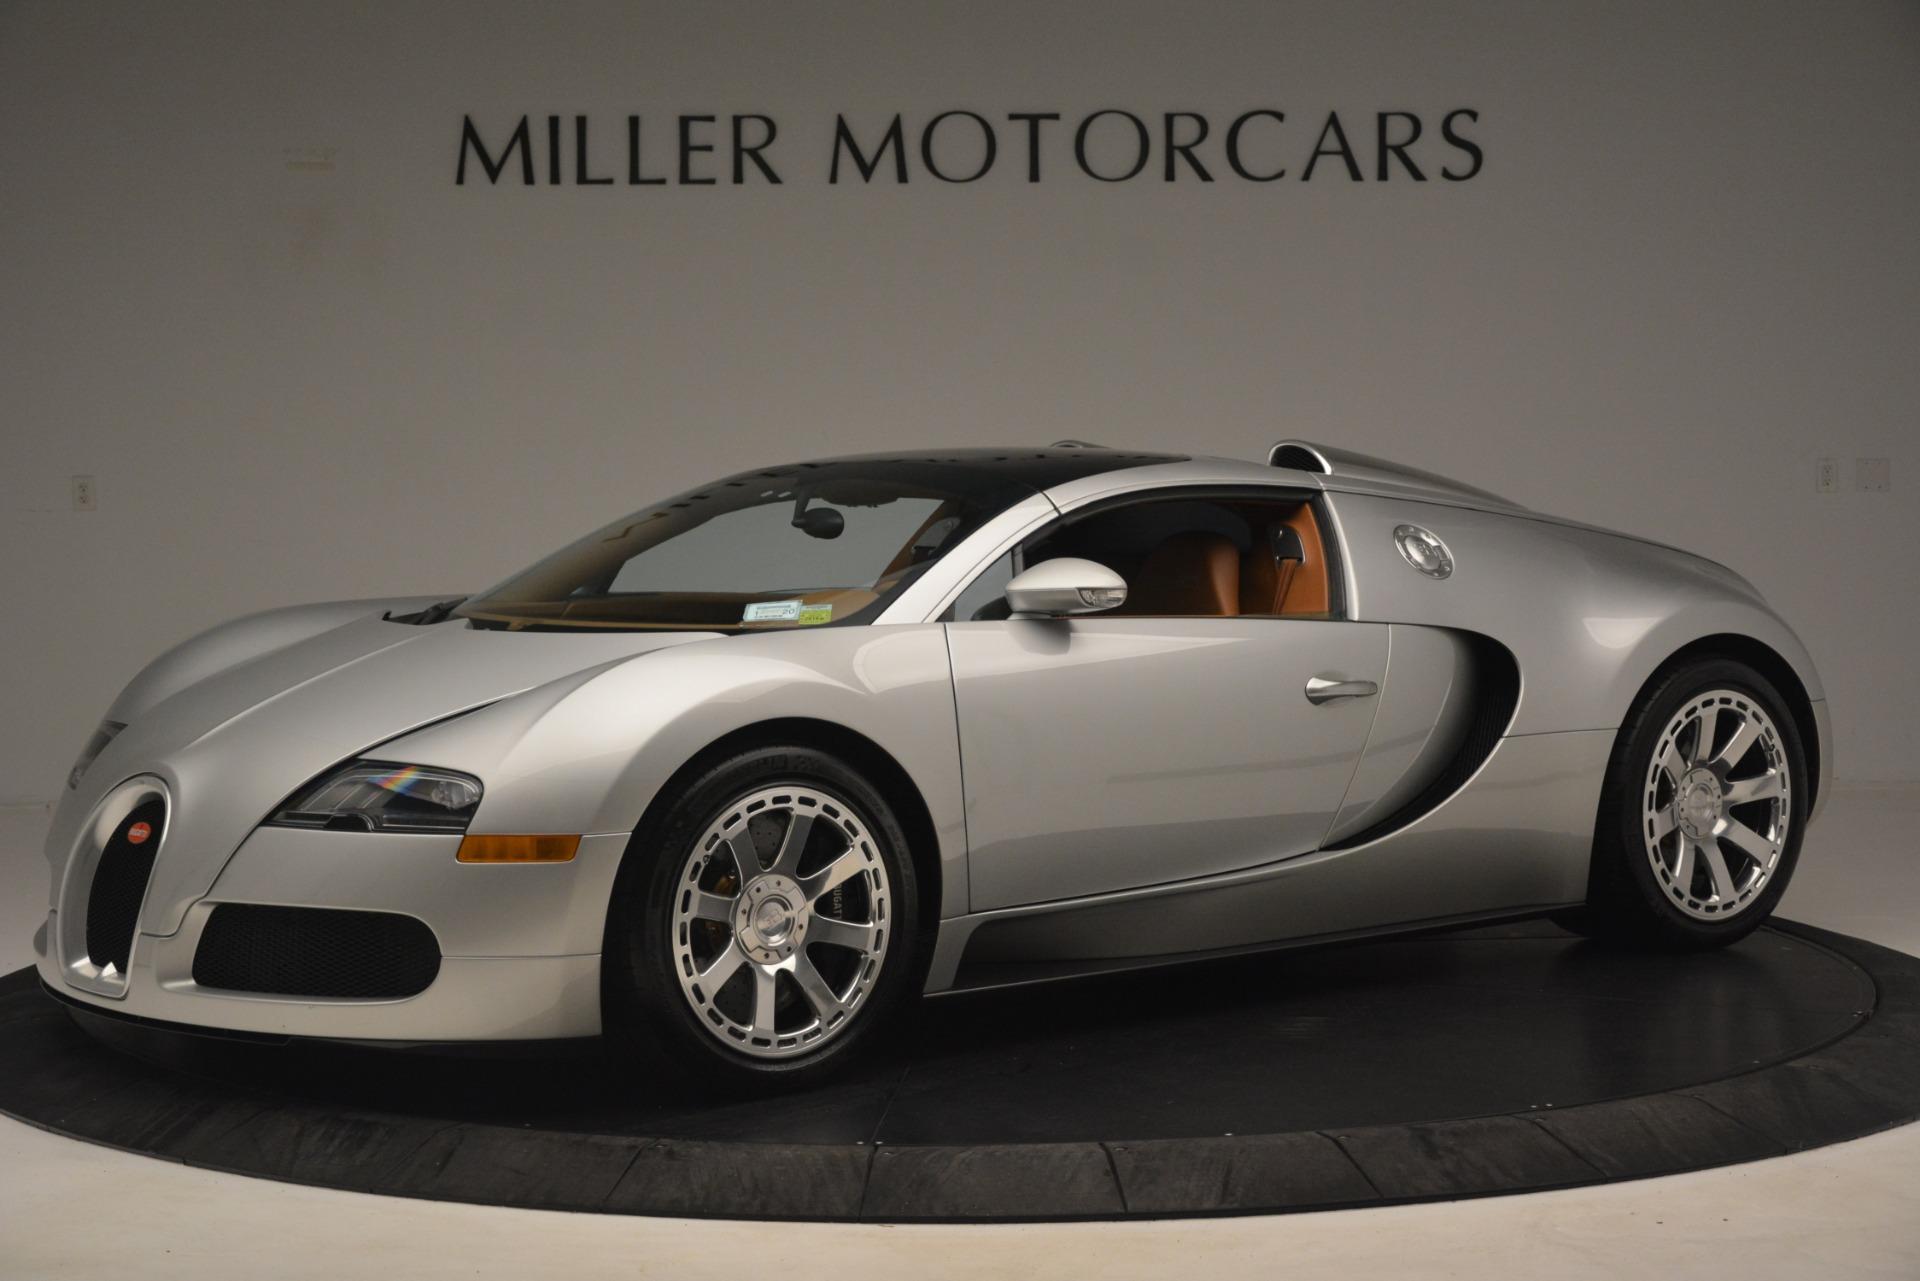 Used 2010 Bugatti Veyron 16.4 Grand Sport For Sale In Greenwich, CT 3159_p13